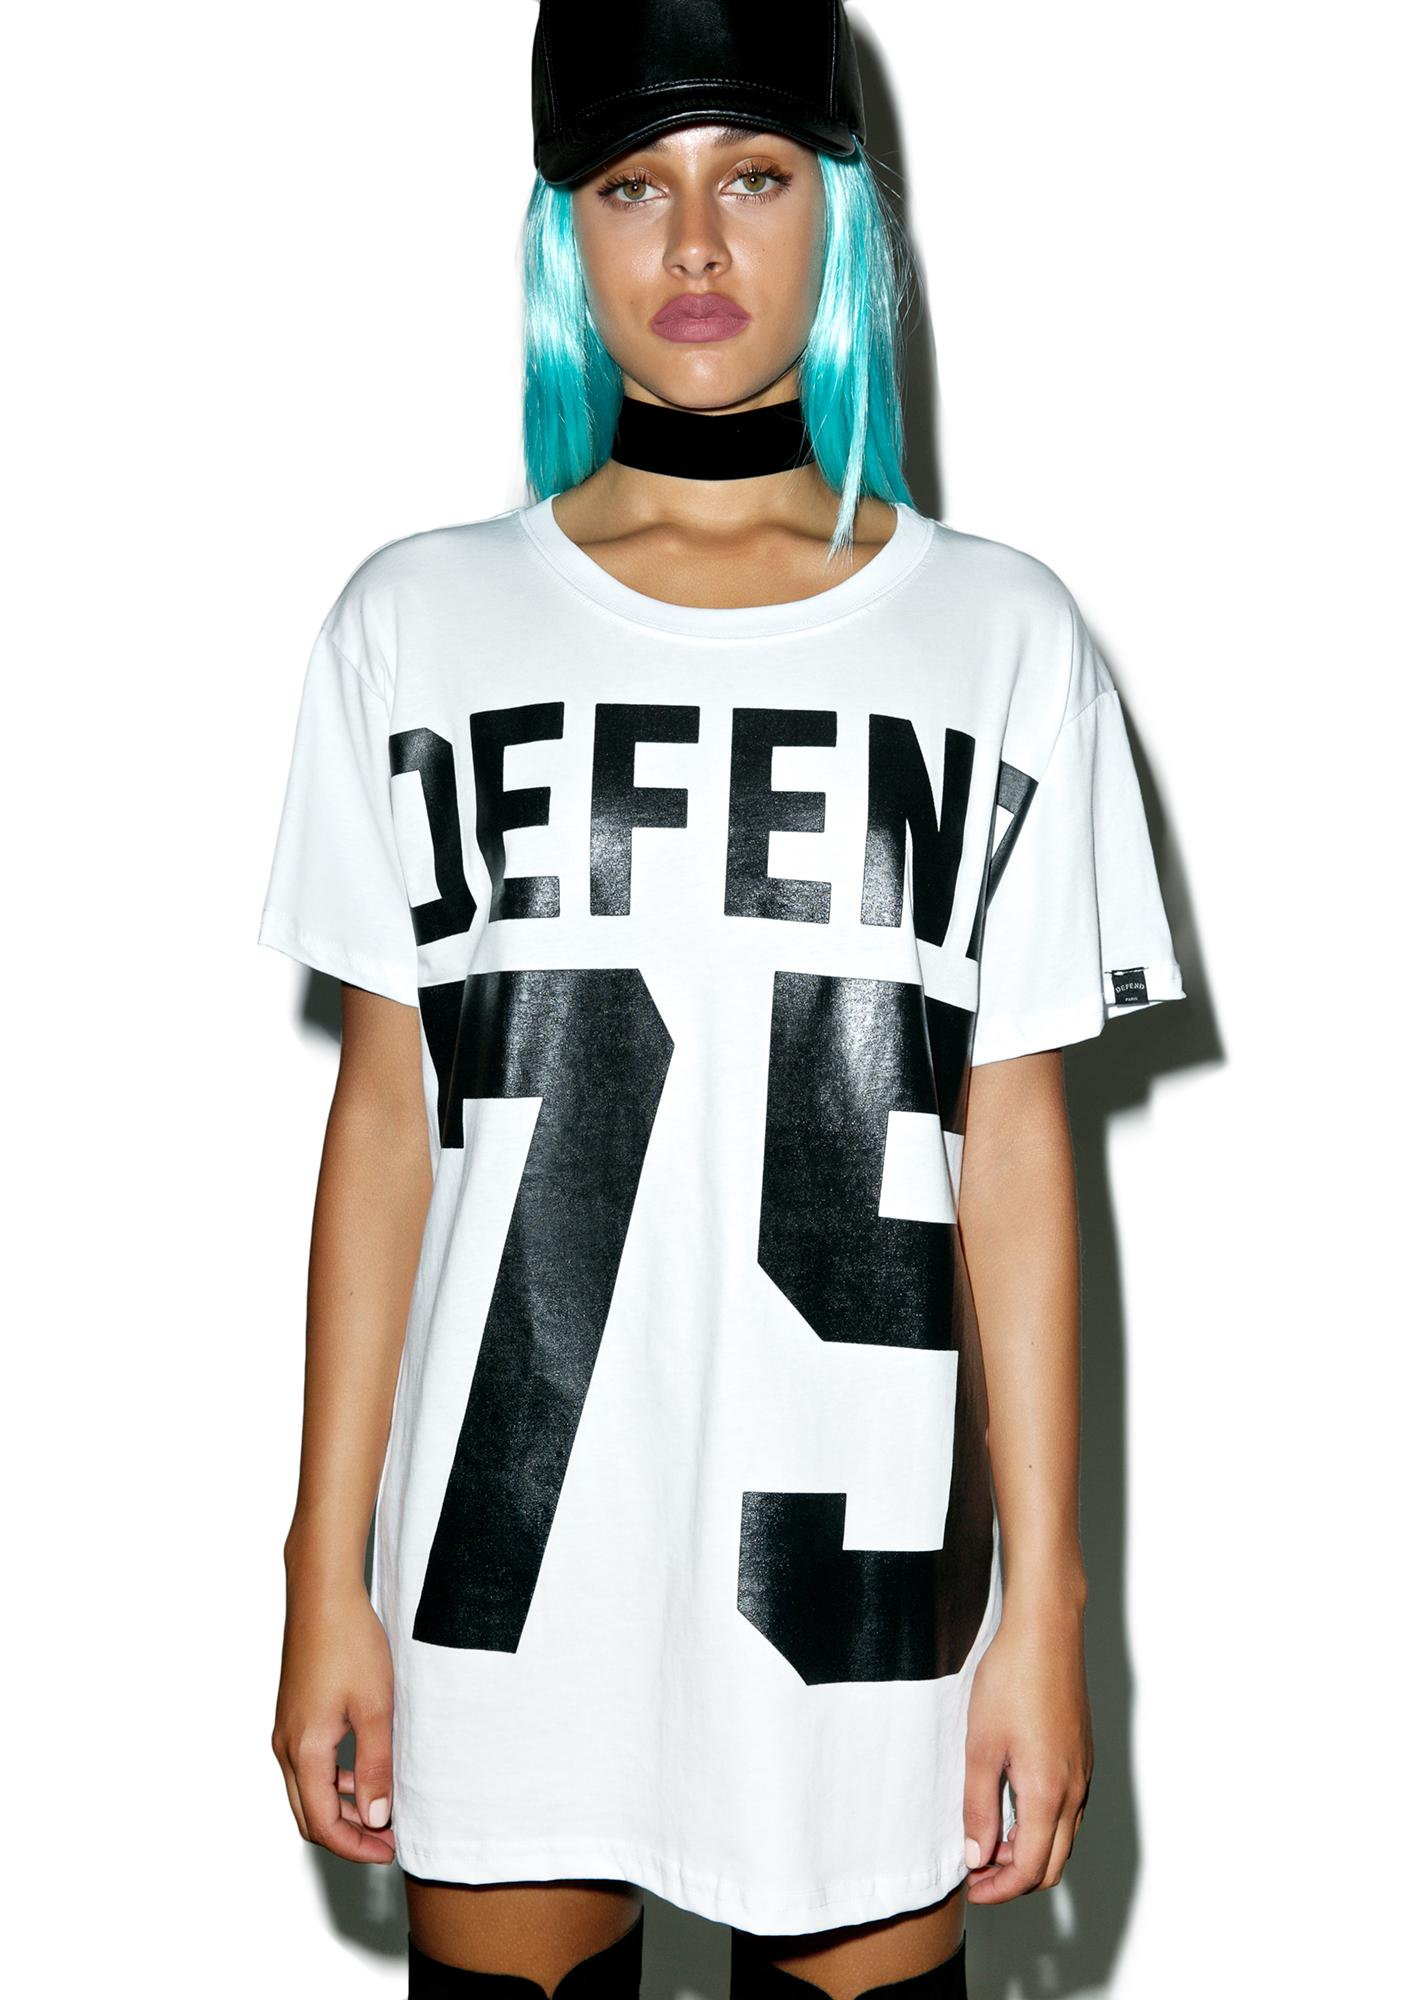 Defend Paris Defend 75 T-Shirt